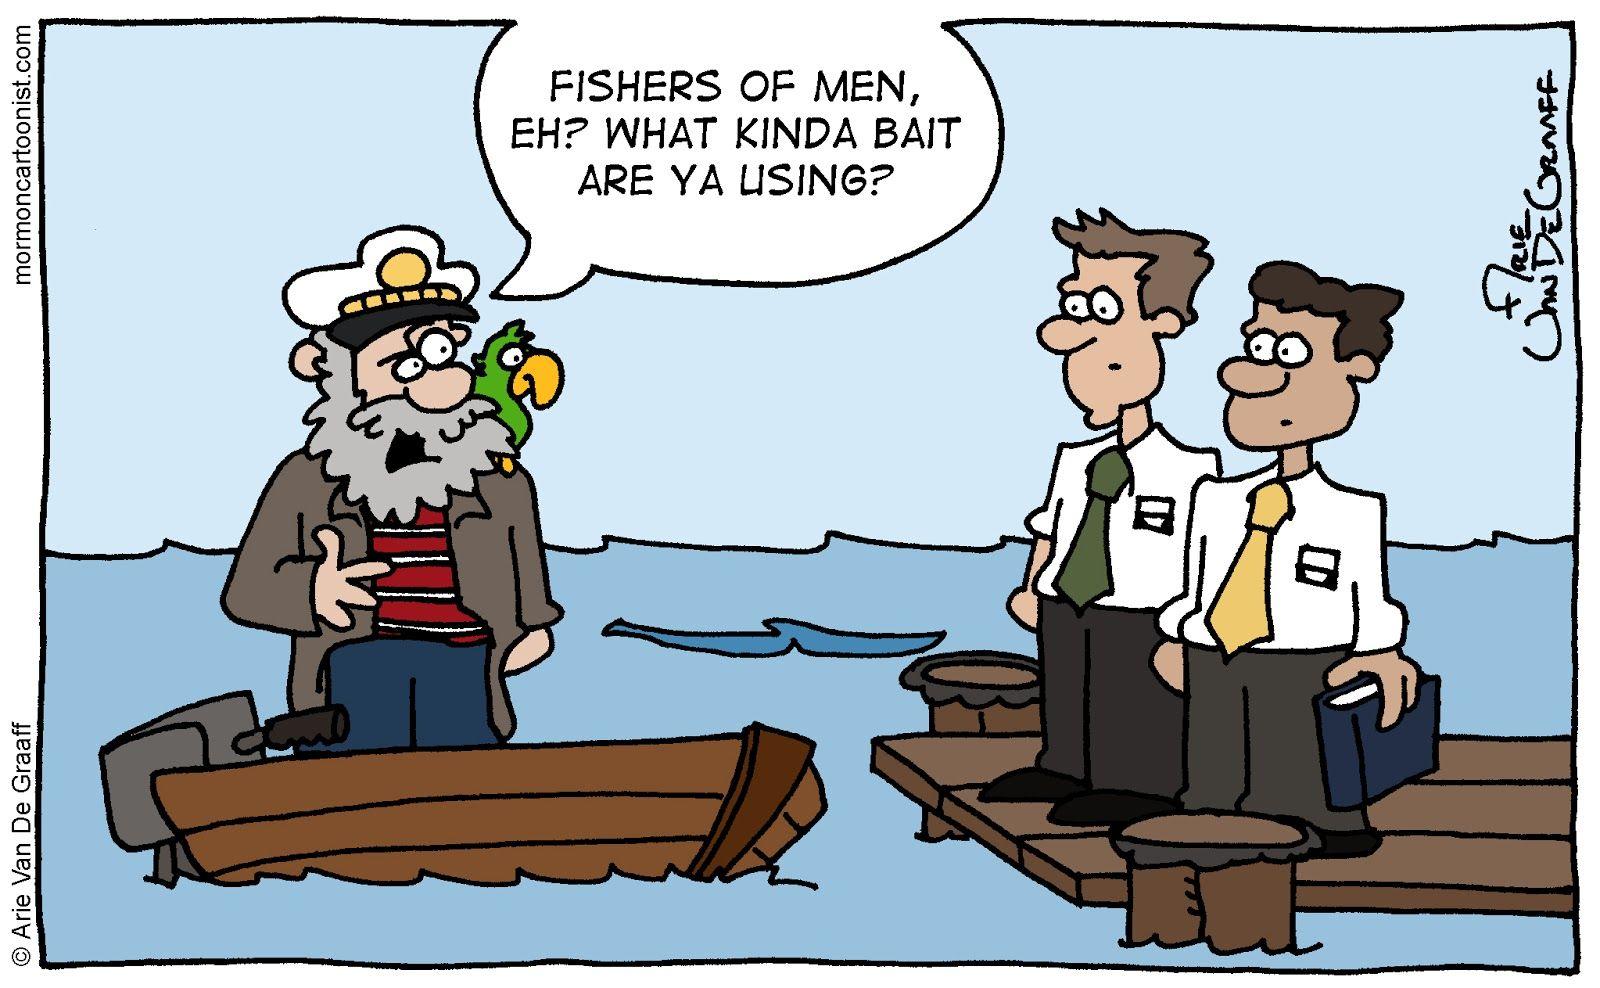 Fishers of men church memes lds memes mormon humor